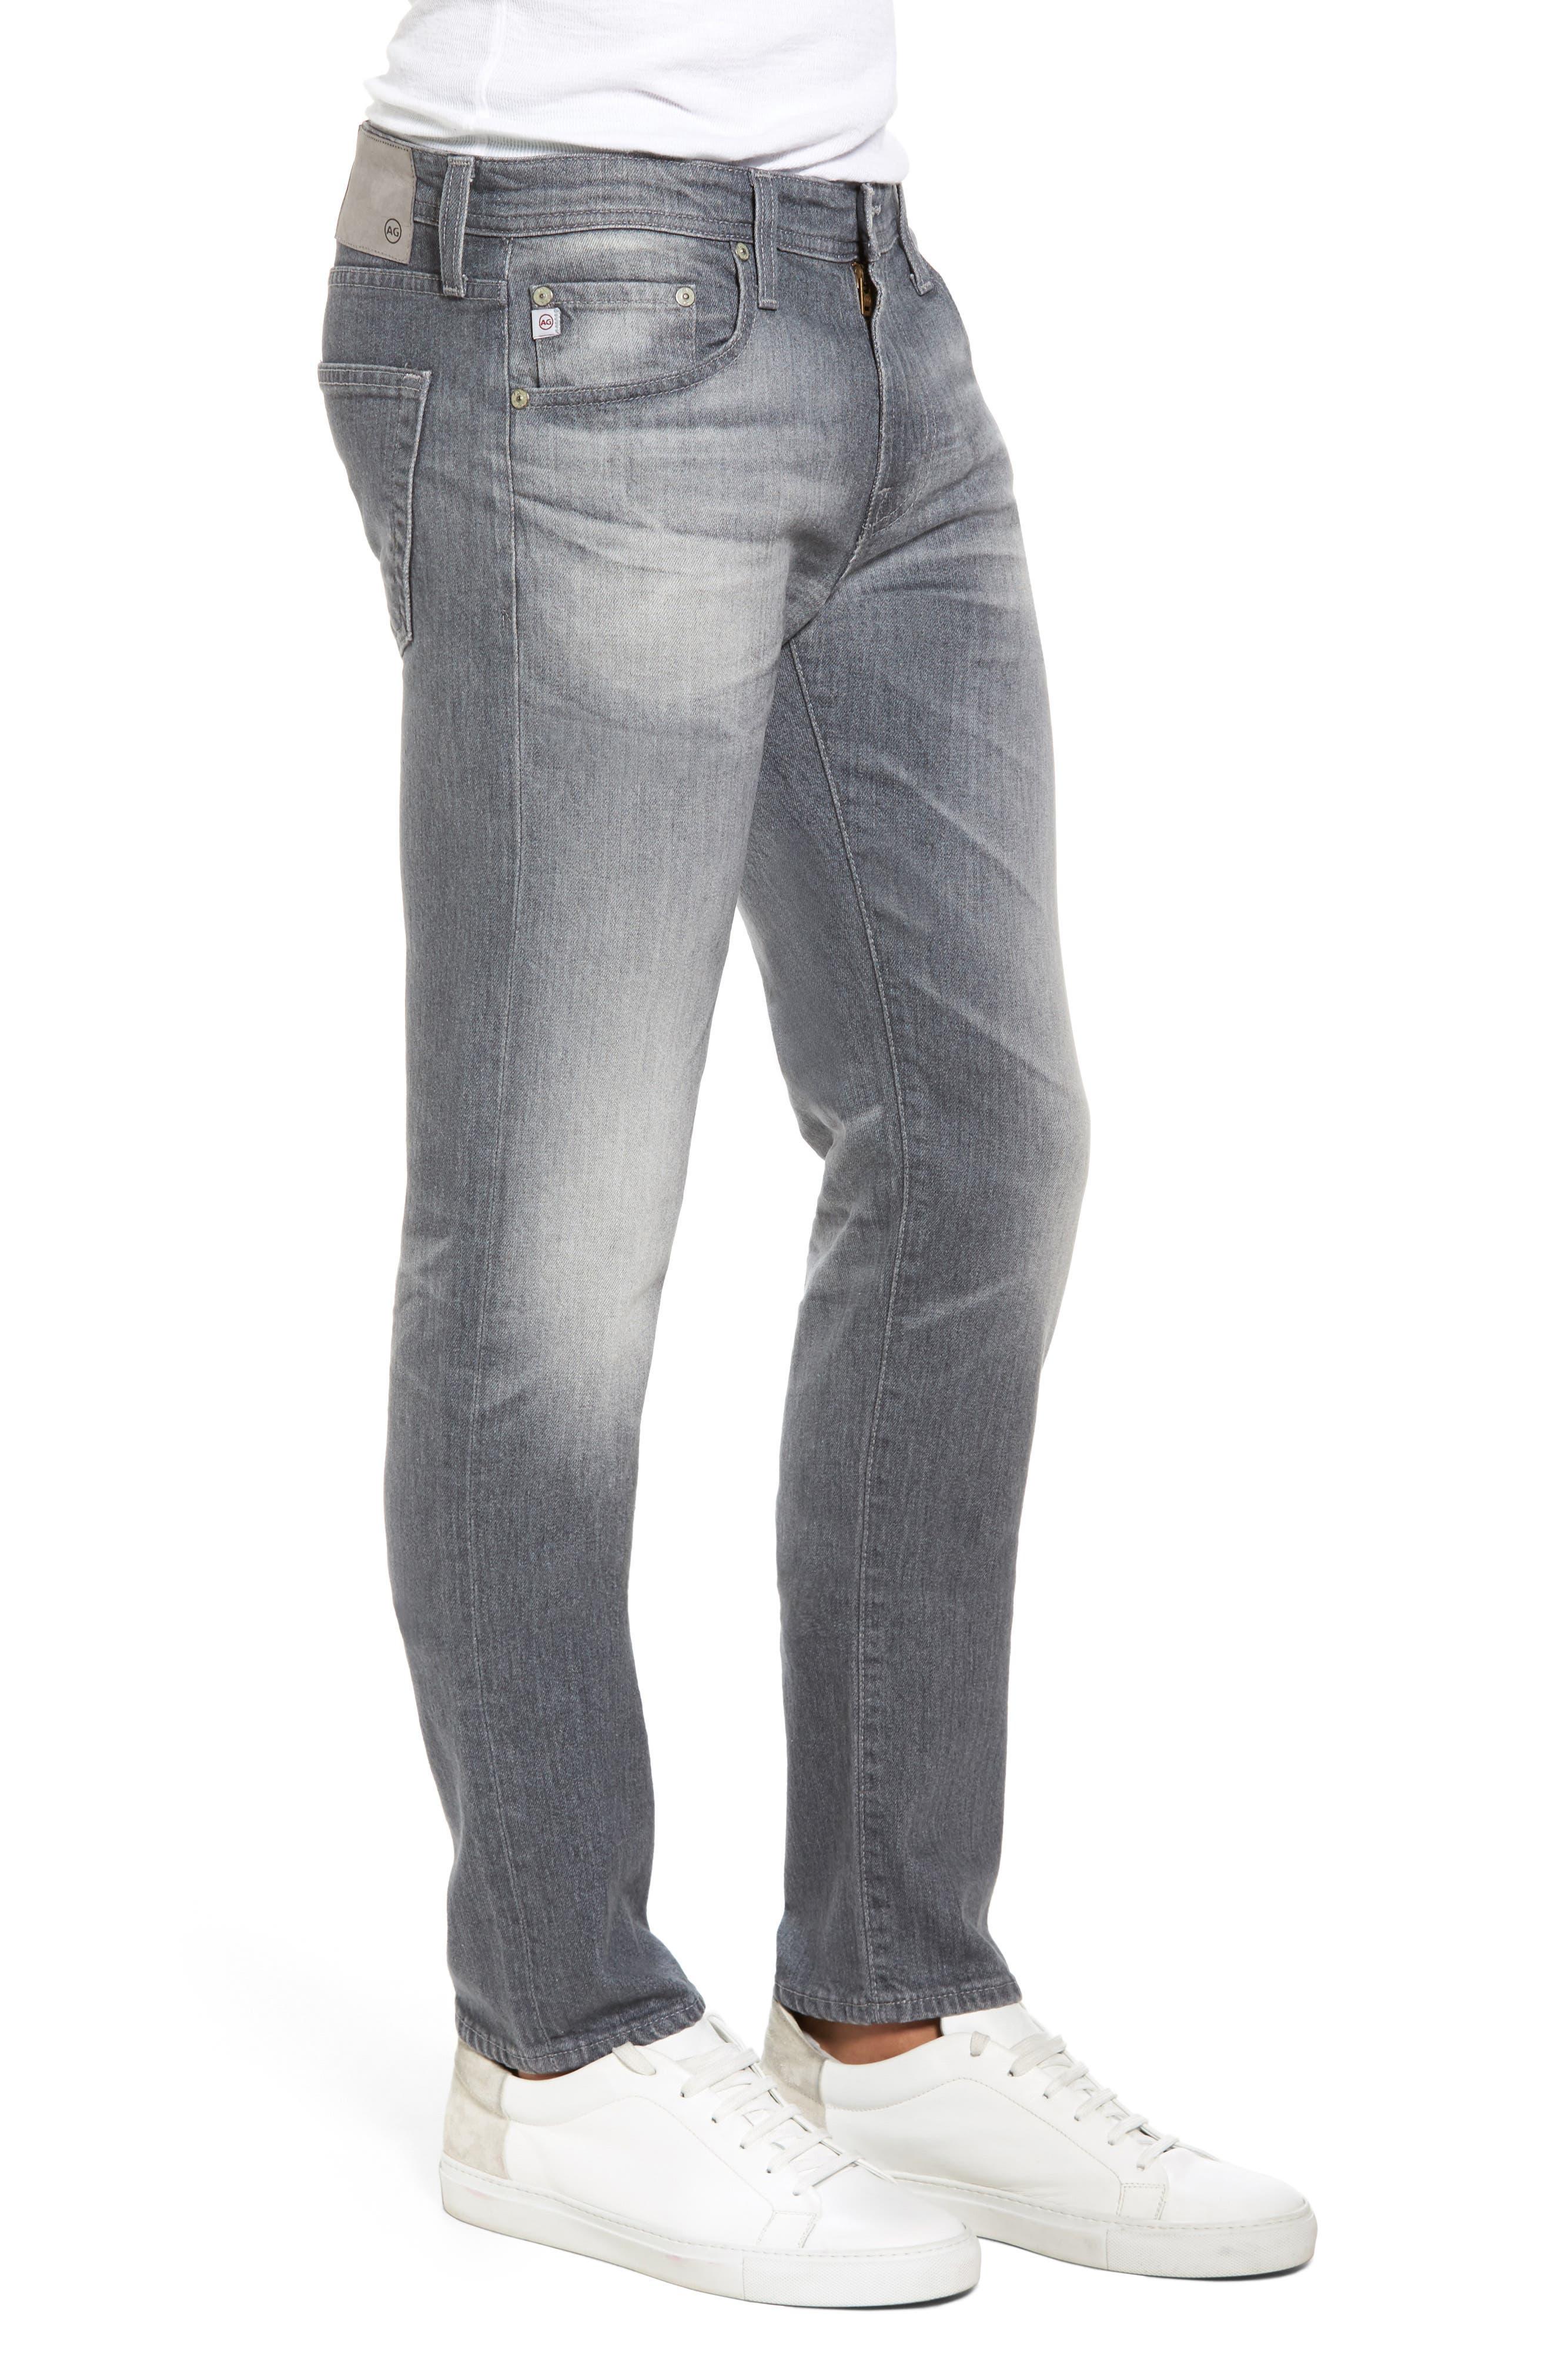 Tellis Modern Slim Fit Jeans,                             Alternate thumbnail 3, color,                             020